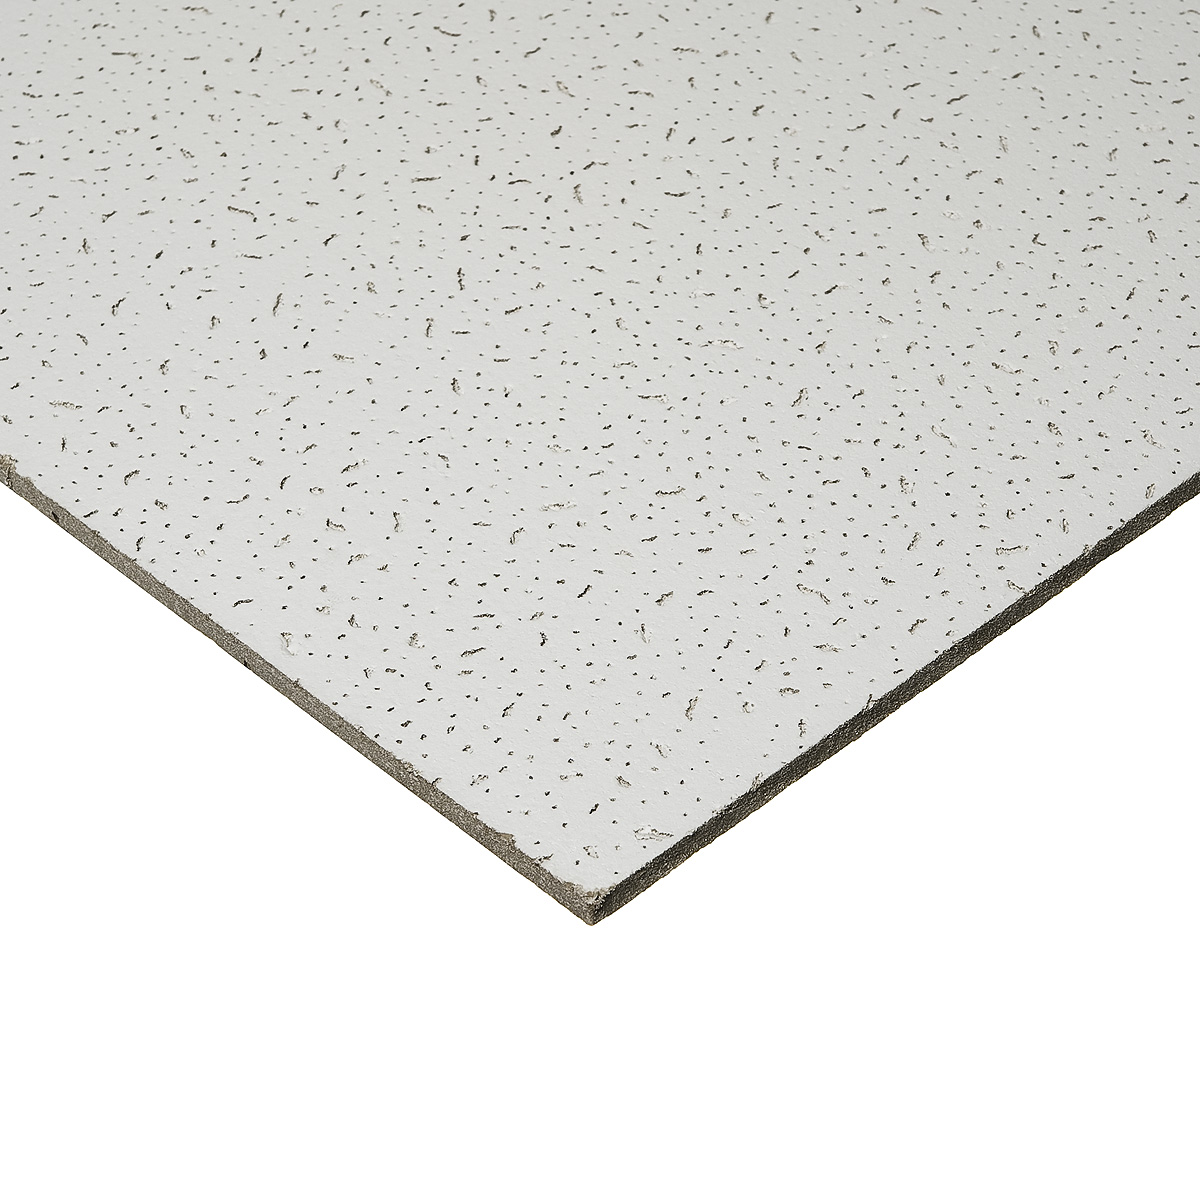 Плита к подвесному потолку  Байкал (кромка Board) 600х600х12 мм